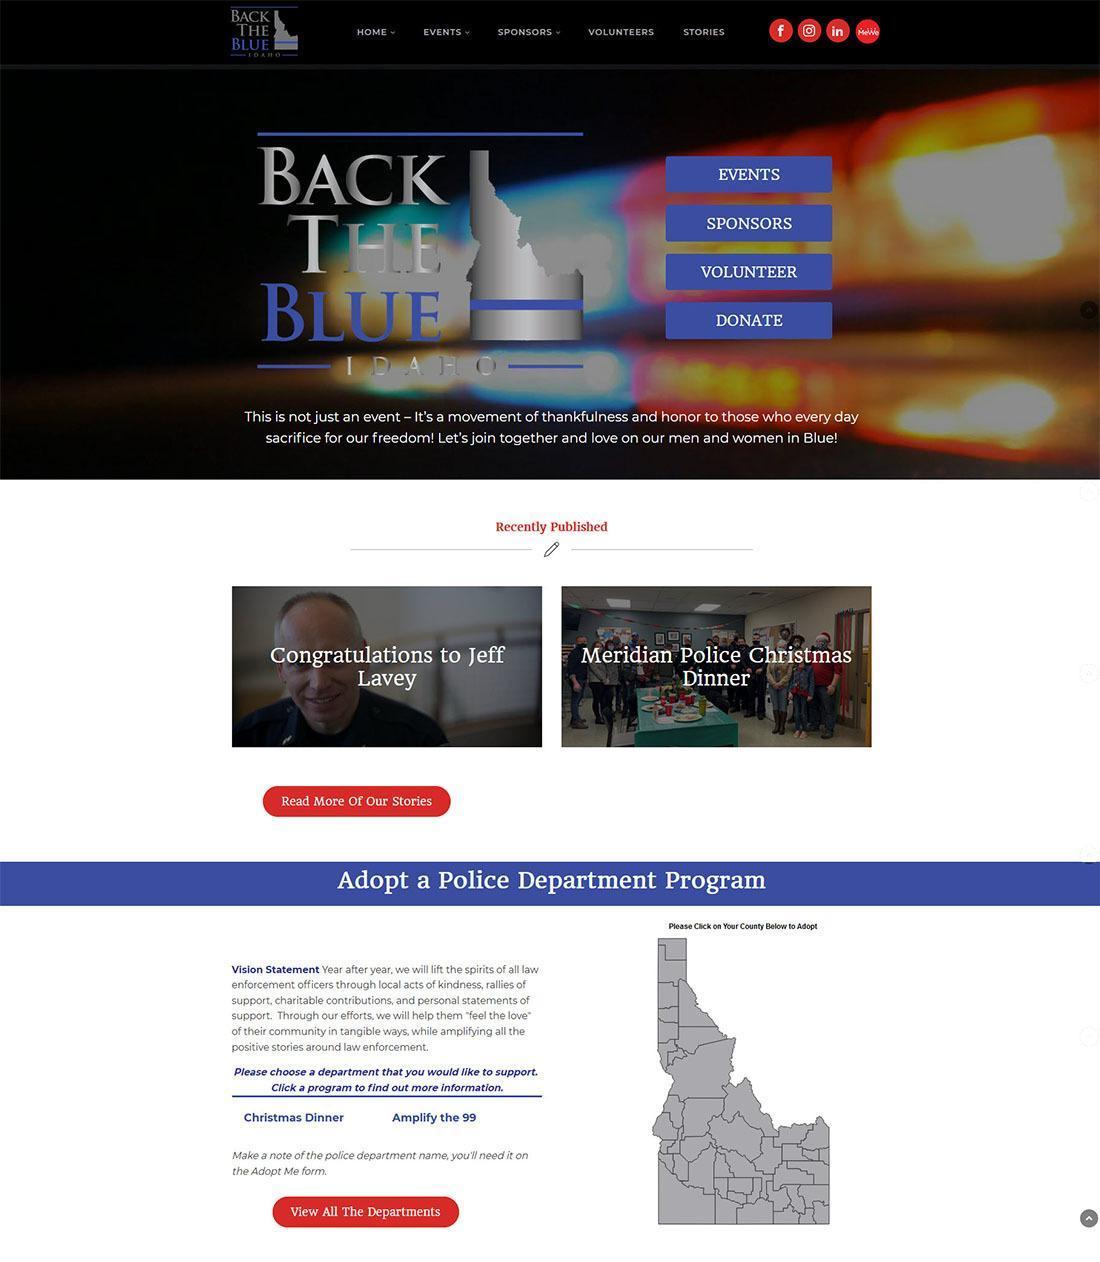 Homepage image of Back the Blue Idaho